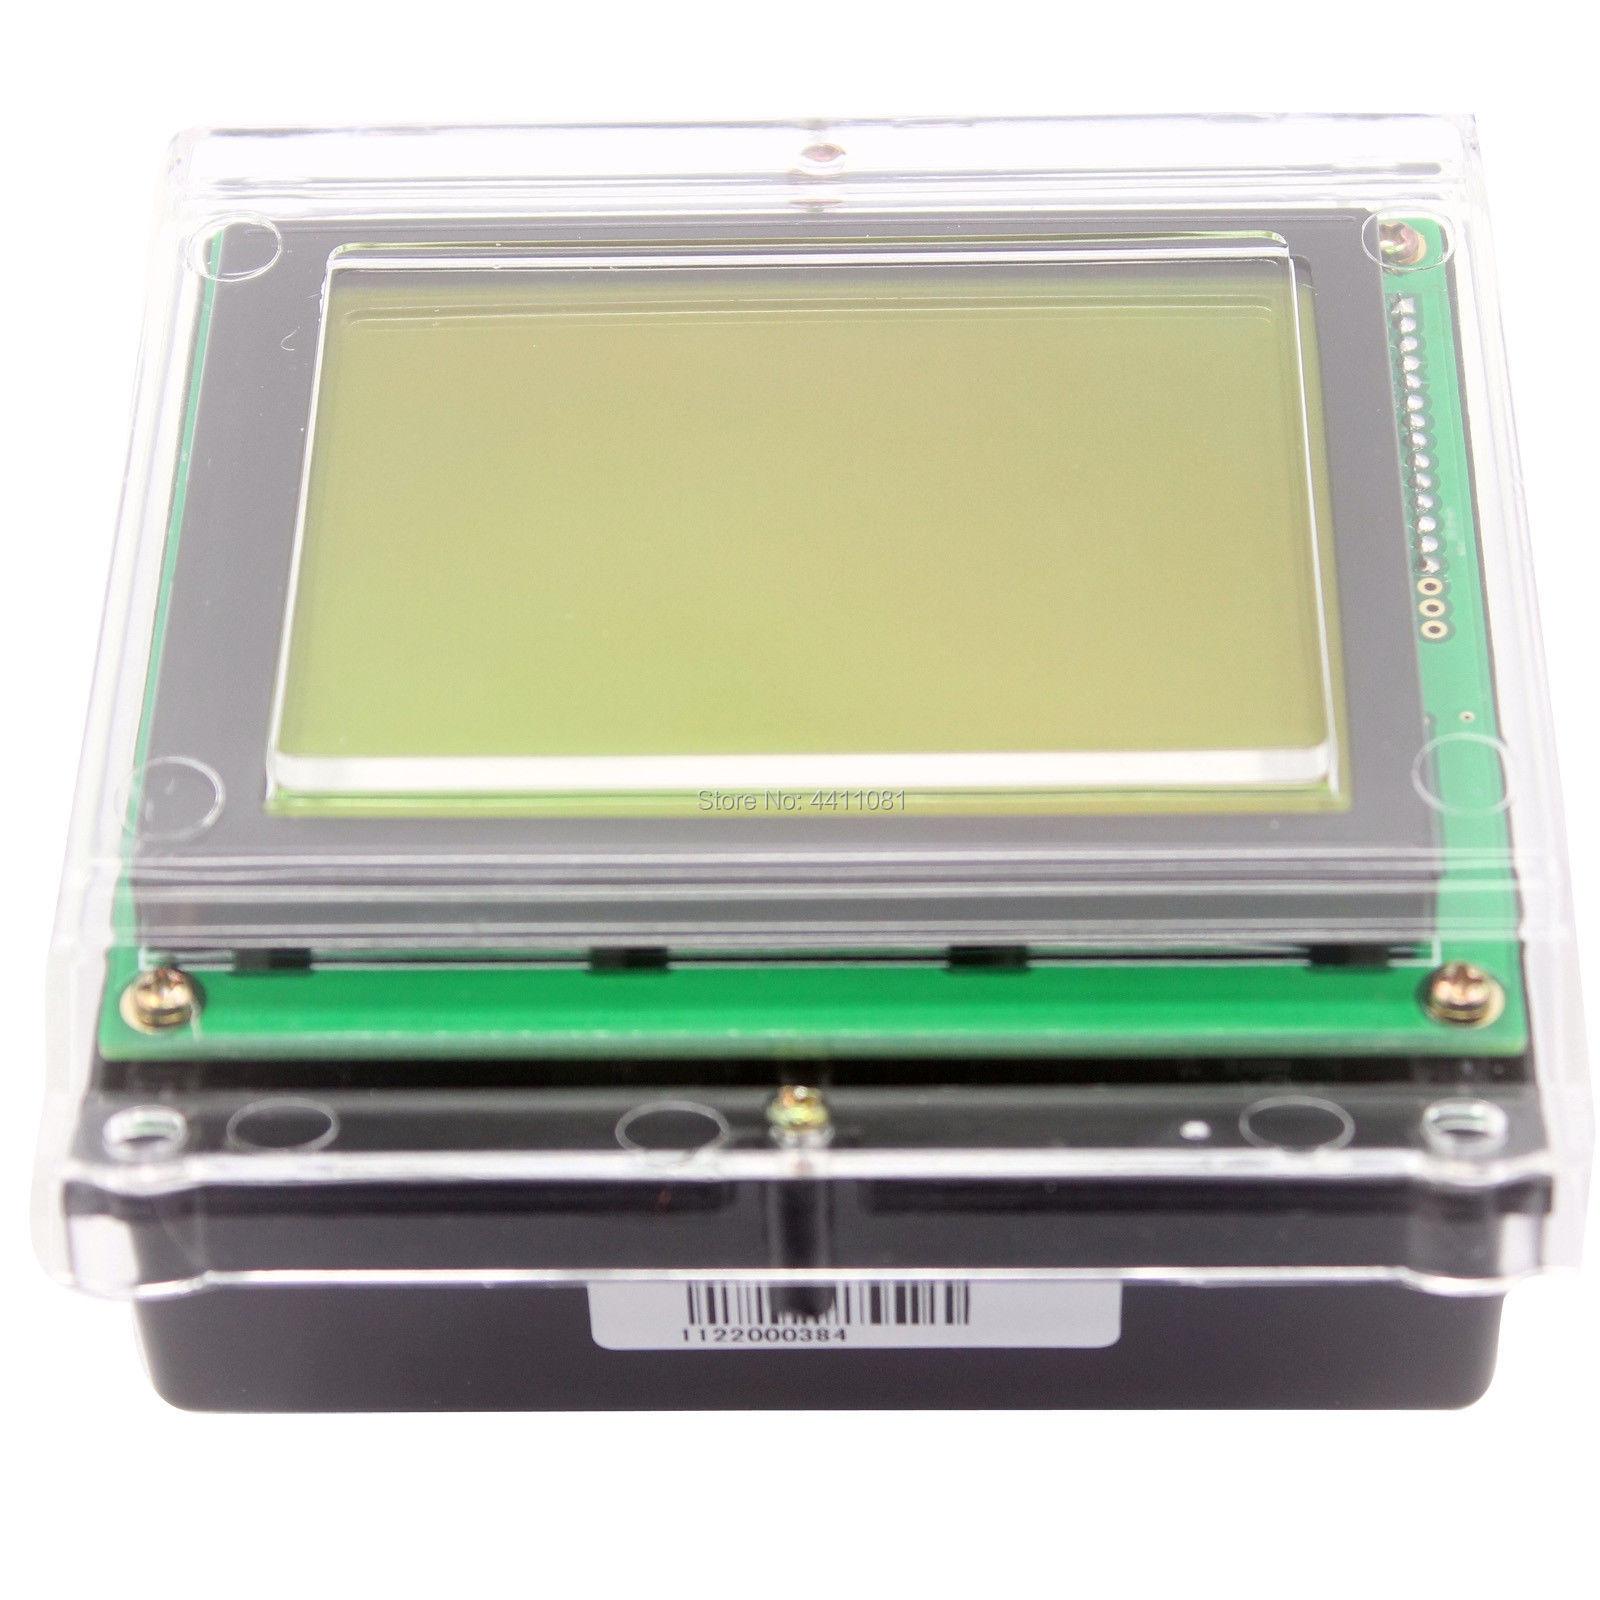 SK120-5 SK120LC-5 SK200-5 SK200LC-5 LCD Monitor Display Screen YN10M00002S013 for Kobelco Excavator, 1 year warrantySK120-5 SK120LC-5 SK200-5 SK200LC-5 LCD Monitor Display Screen YN10M00002S013 for Kobelco Excavator, 1 year warranty